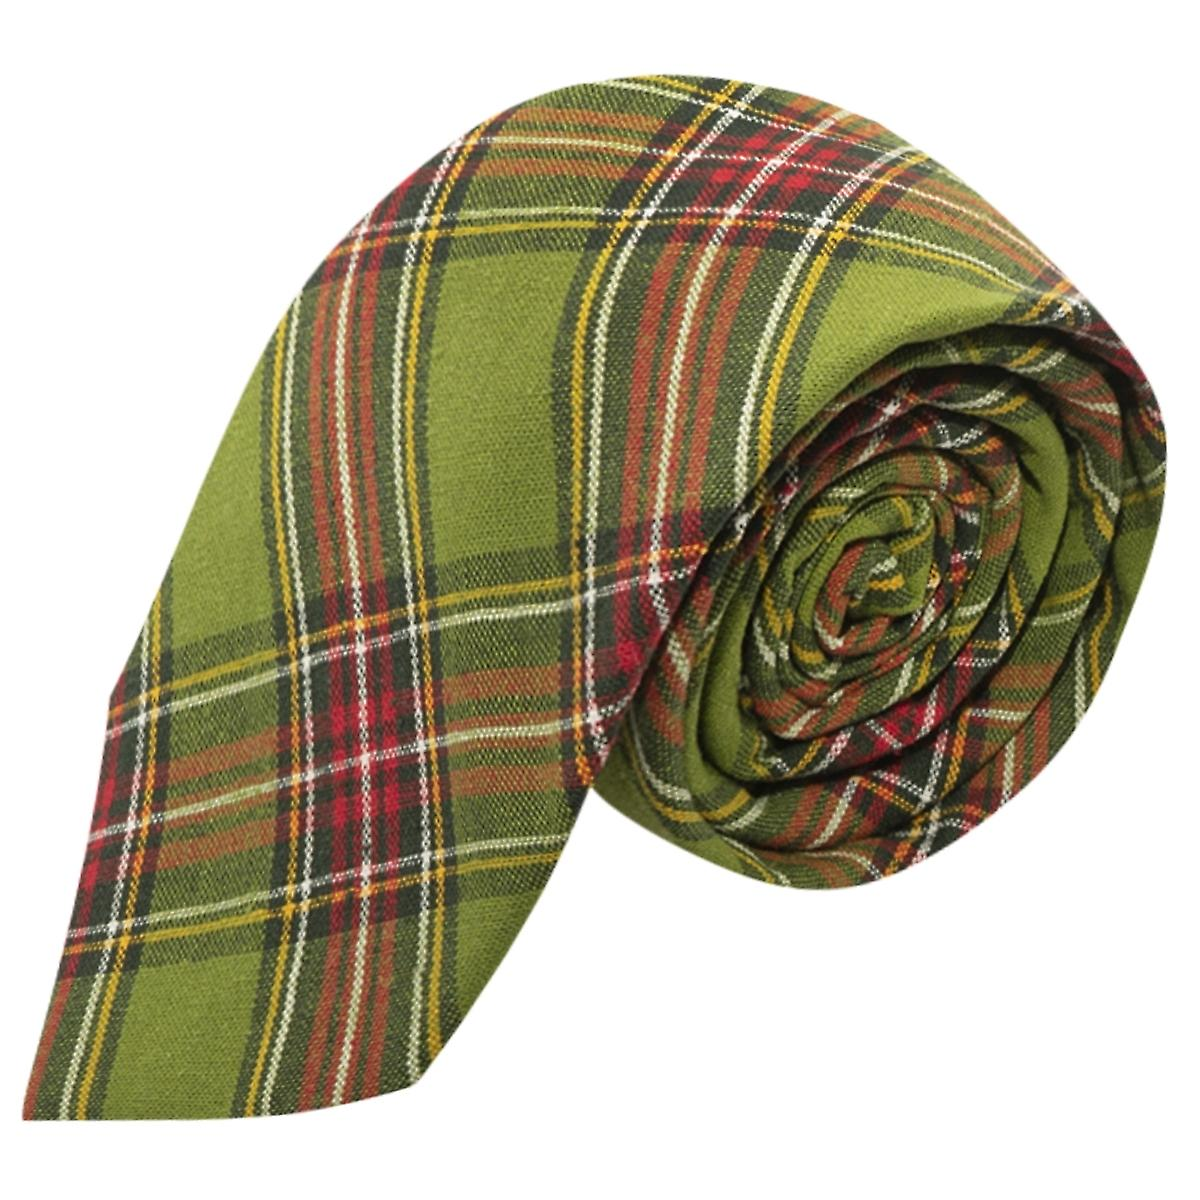 Traditional Green Tartan Tie, Check, Plaid